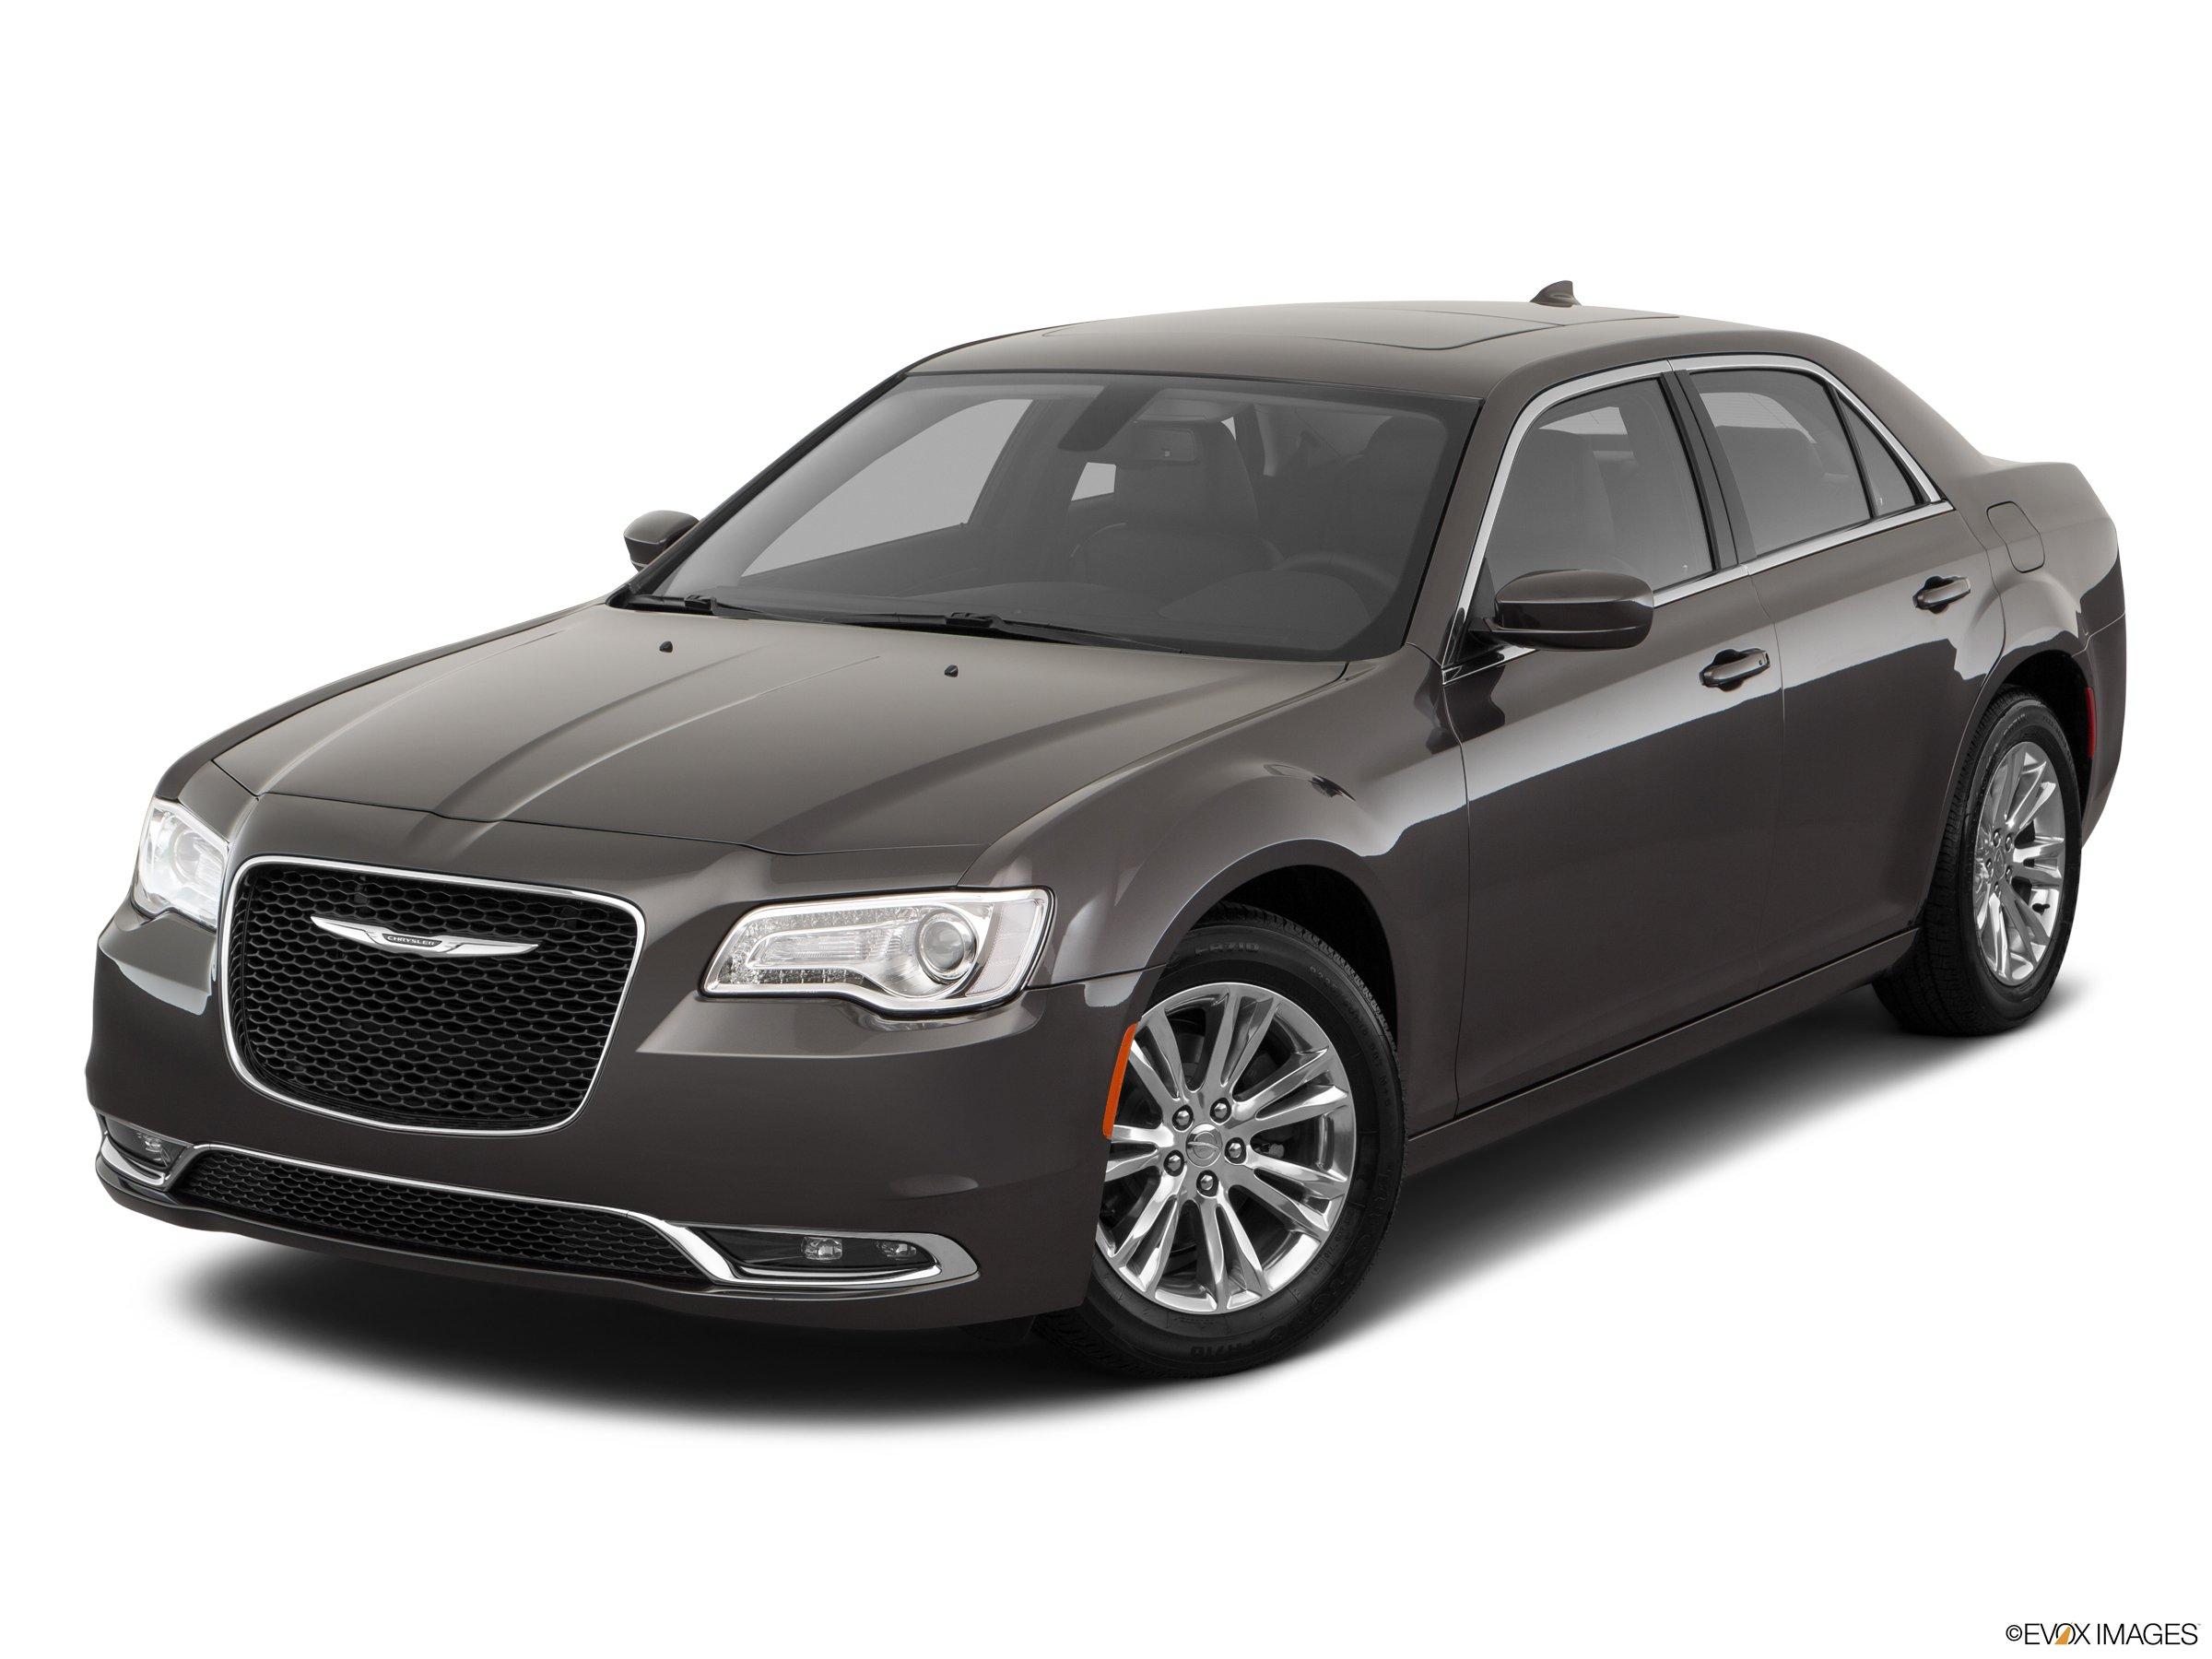 2020 Chrysler 300 Touring L RWD sedan